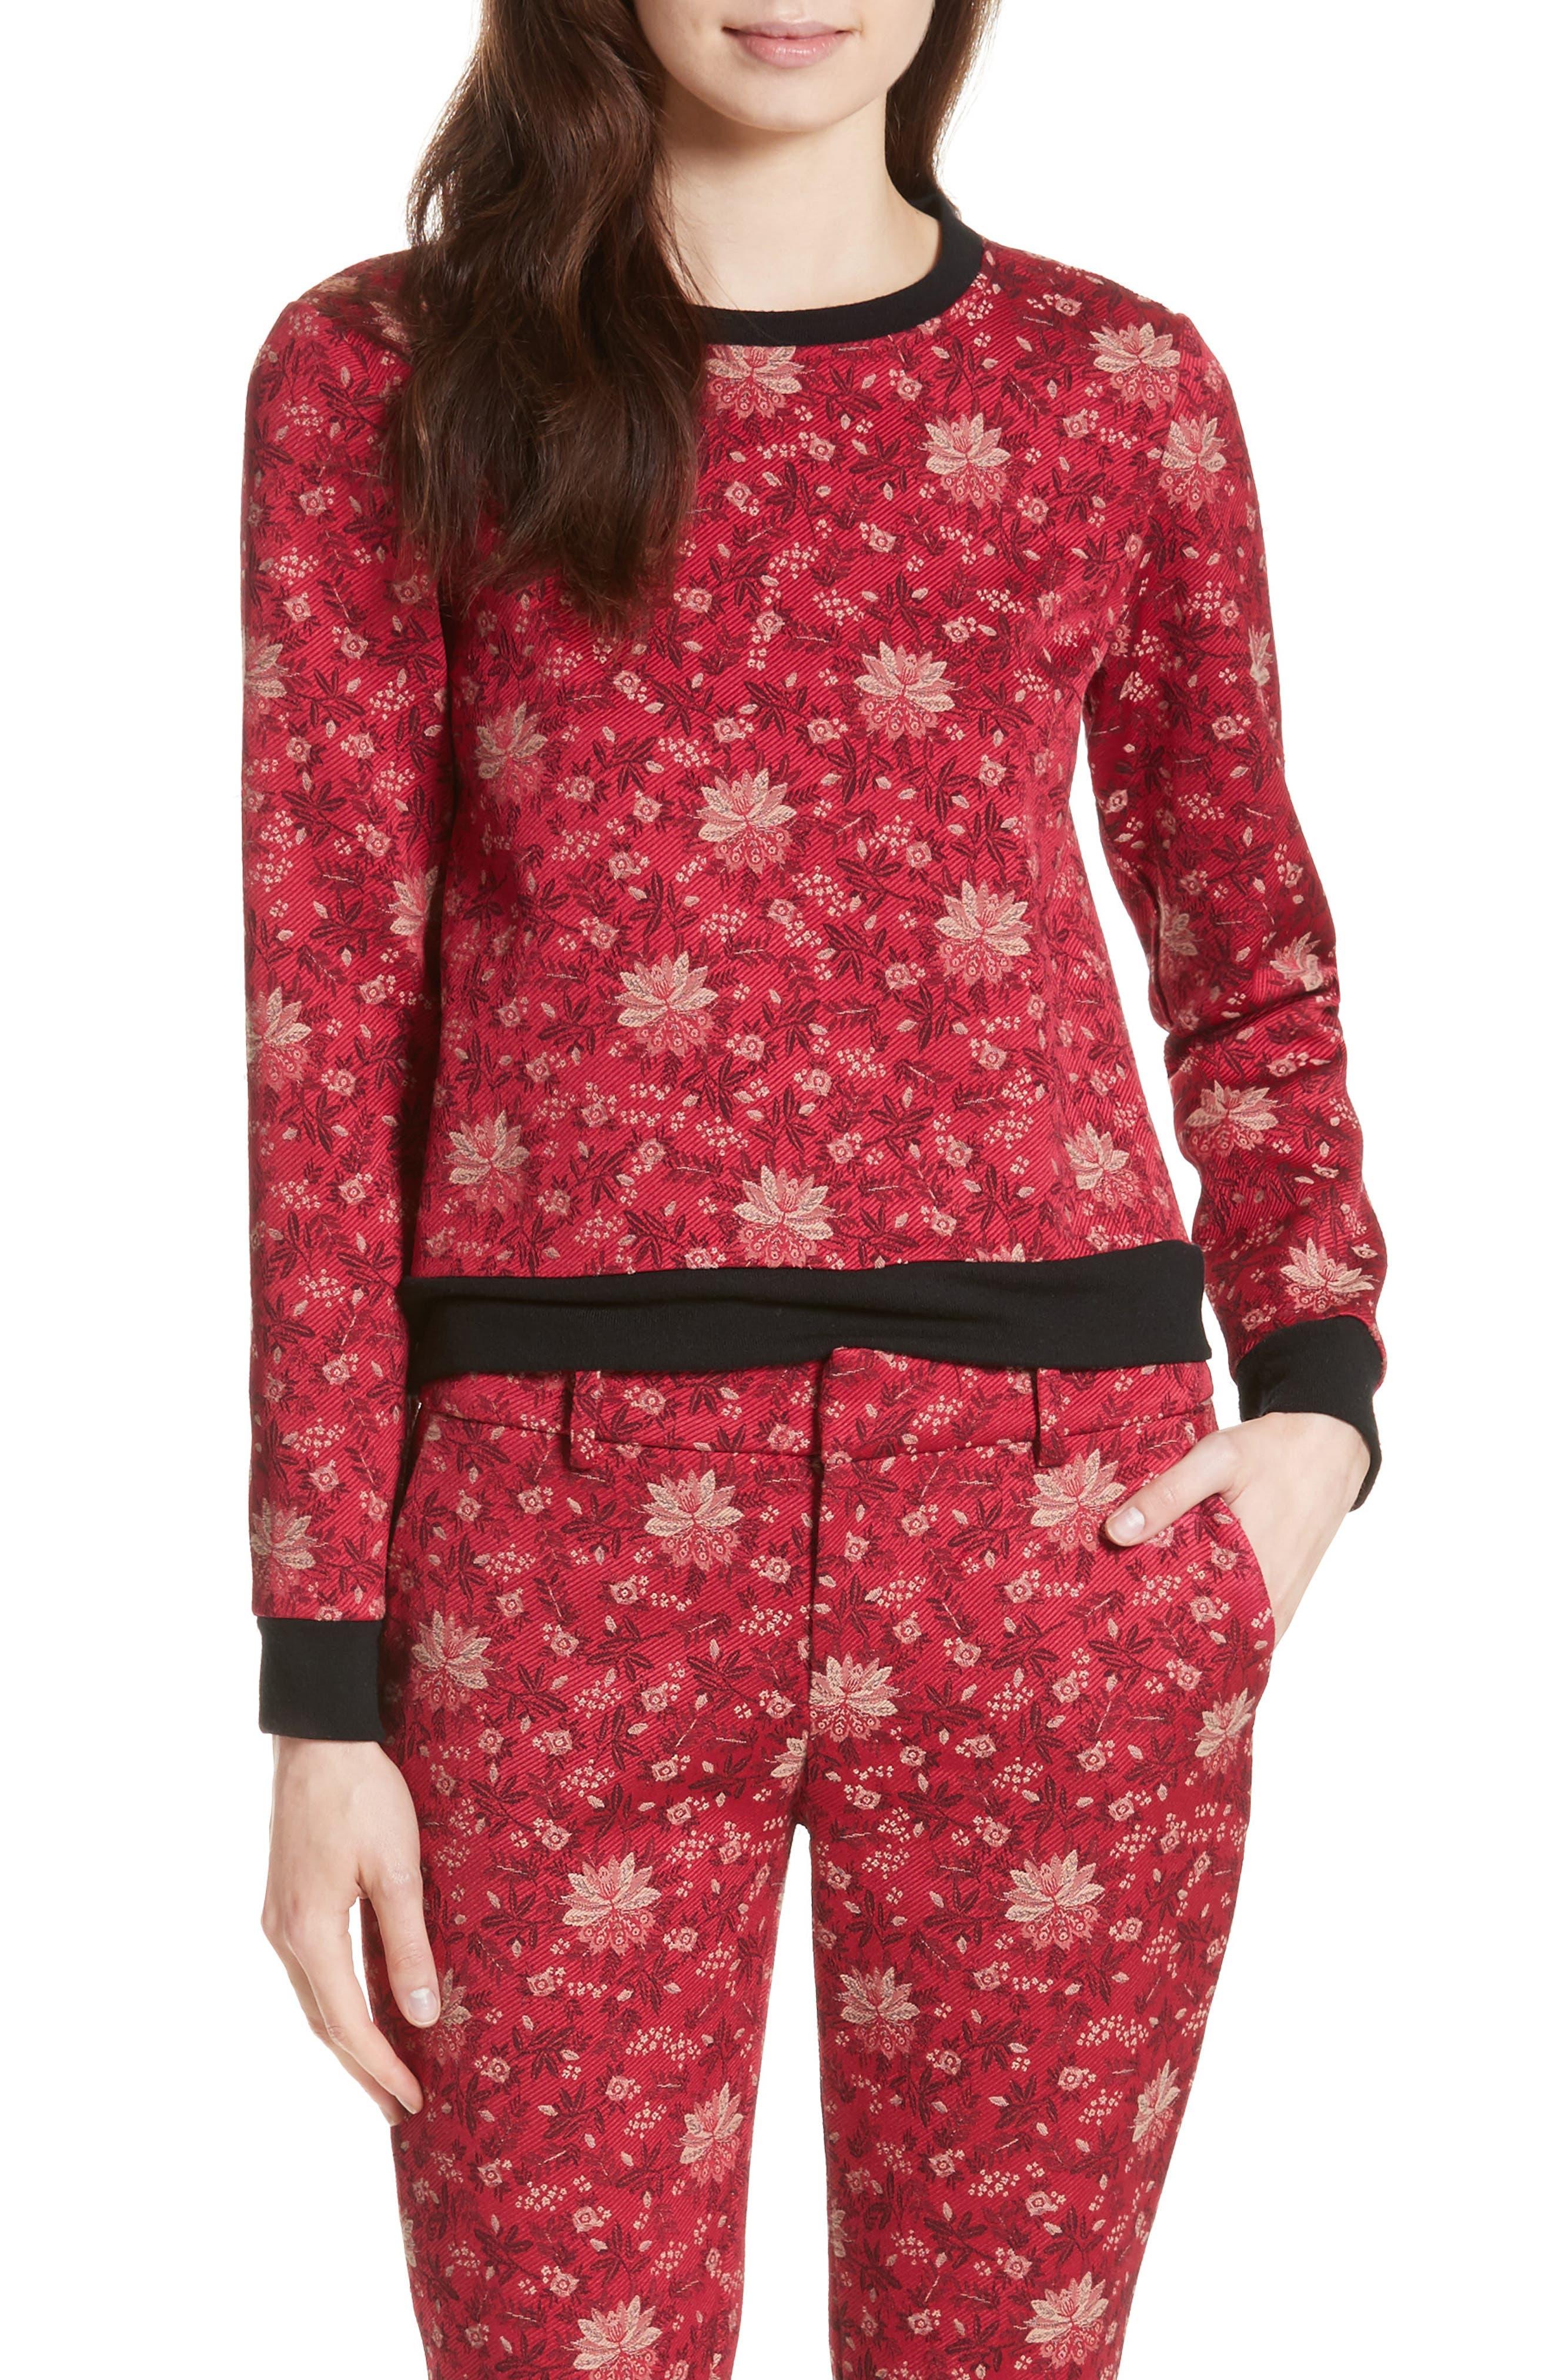 Alice + Olivia Marylou Floral Jacquard Sweatshirt